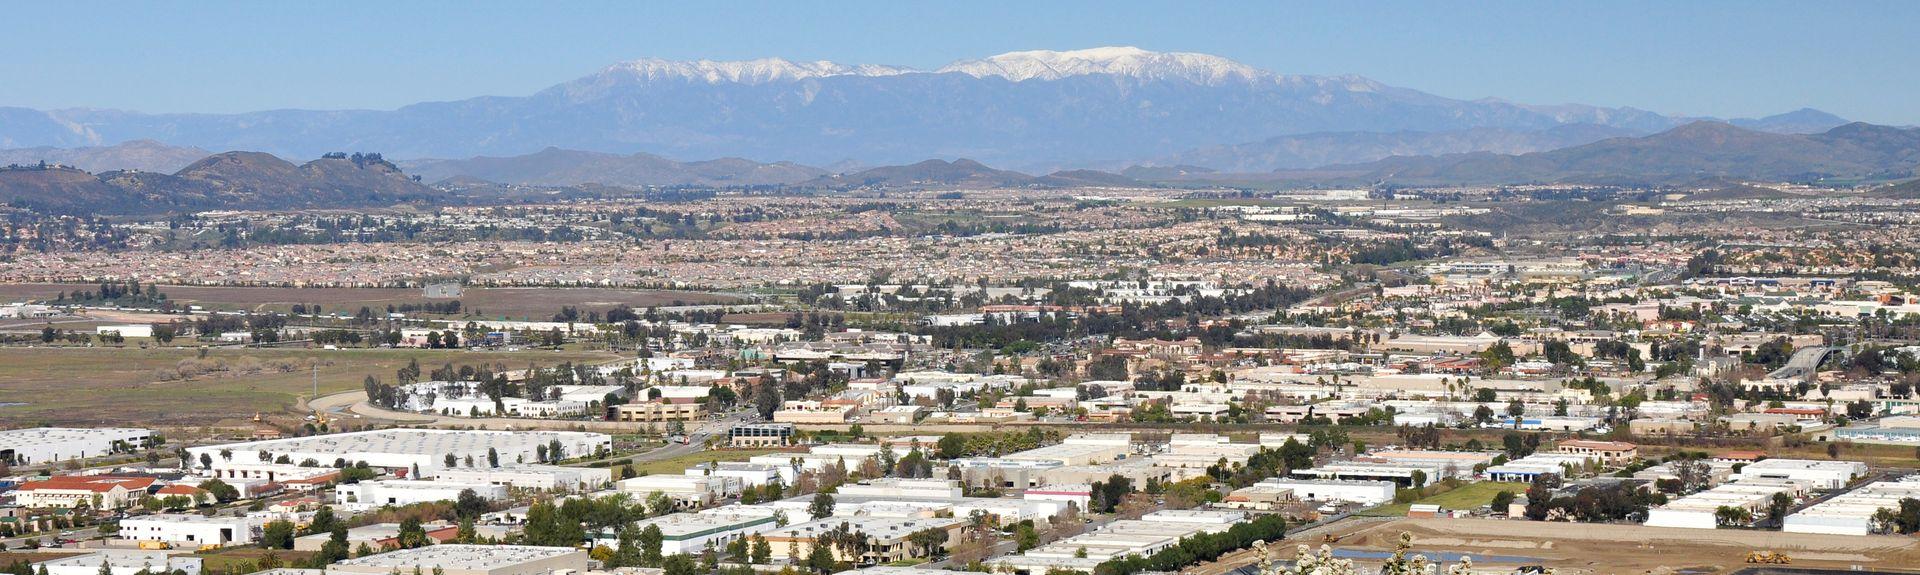 Murrieta, California, United States of America